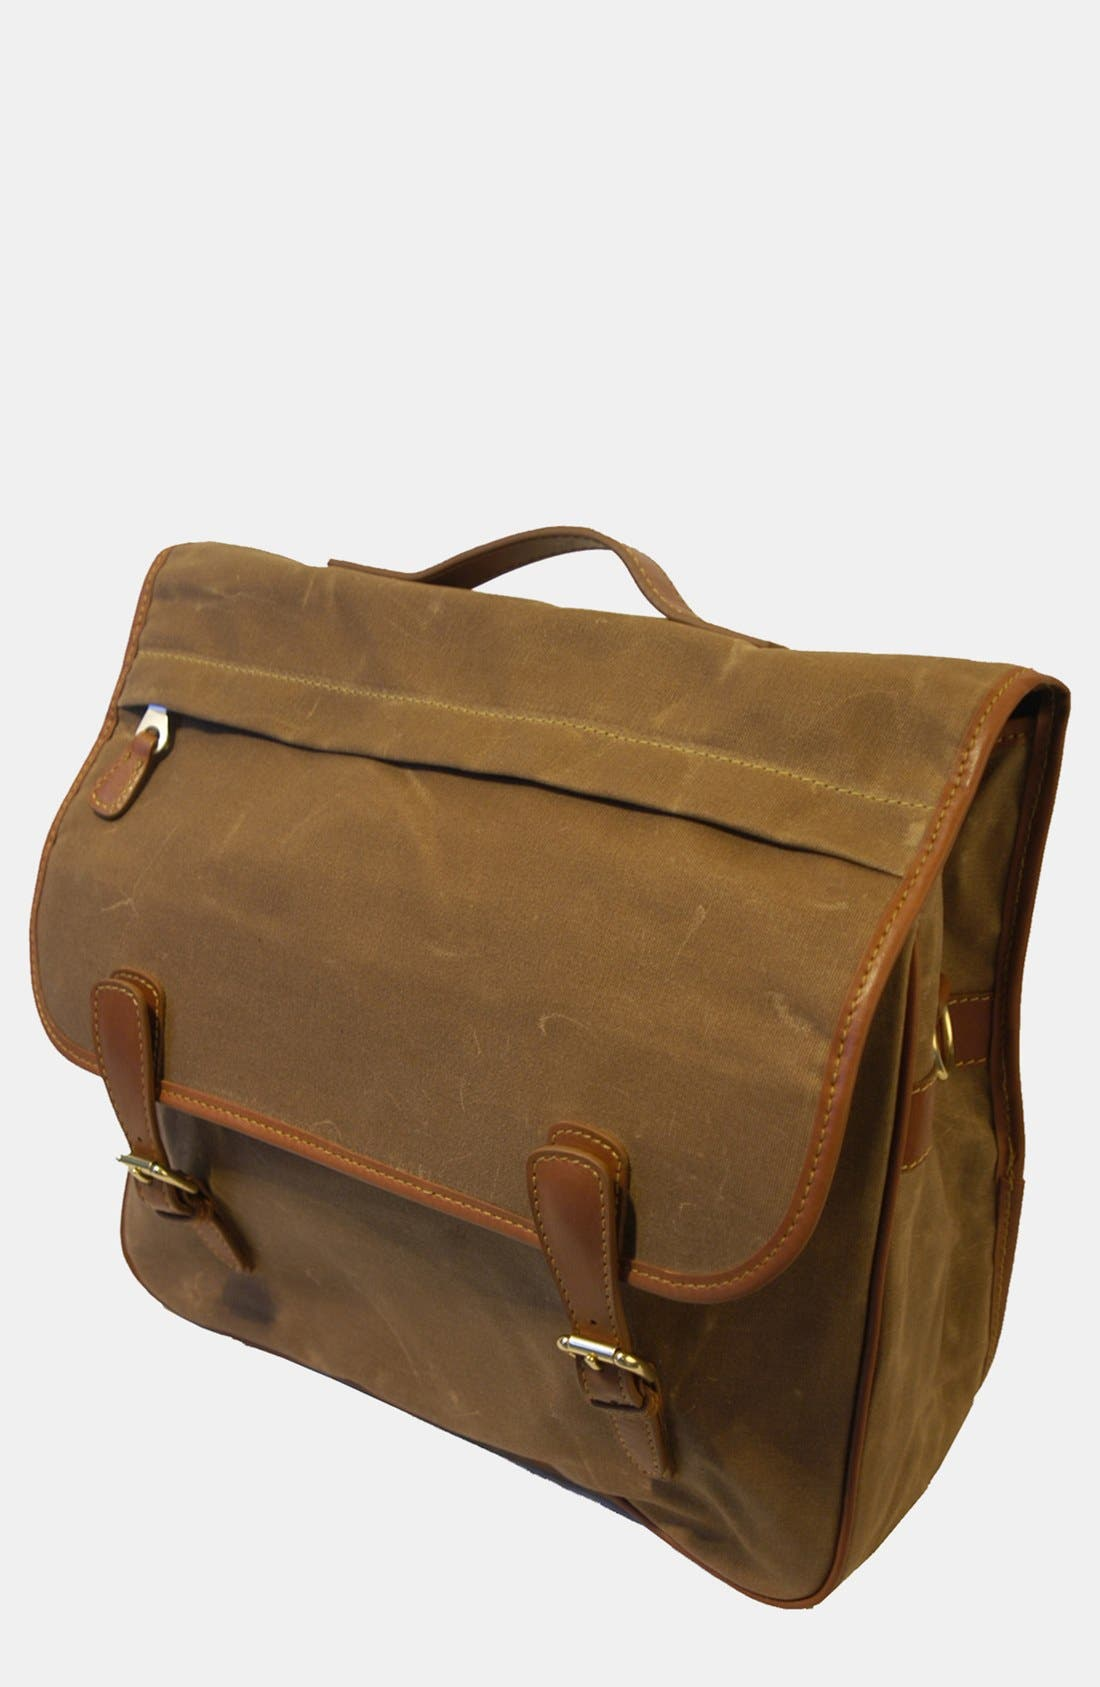 Alternate Image 1 Selected - Mulholland 'Lombard Street' Messenger Bag